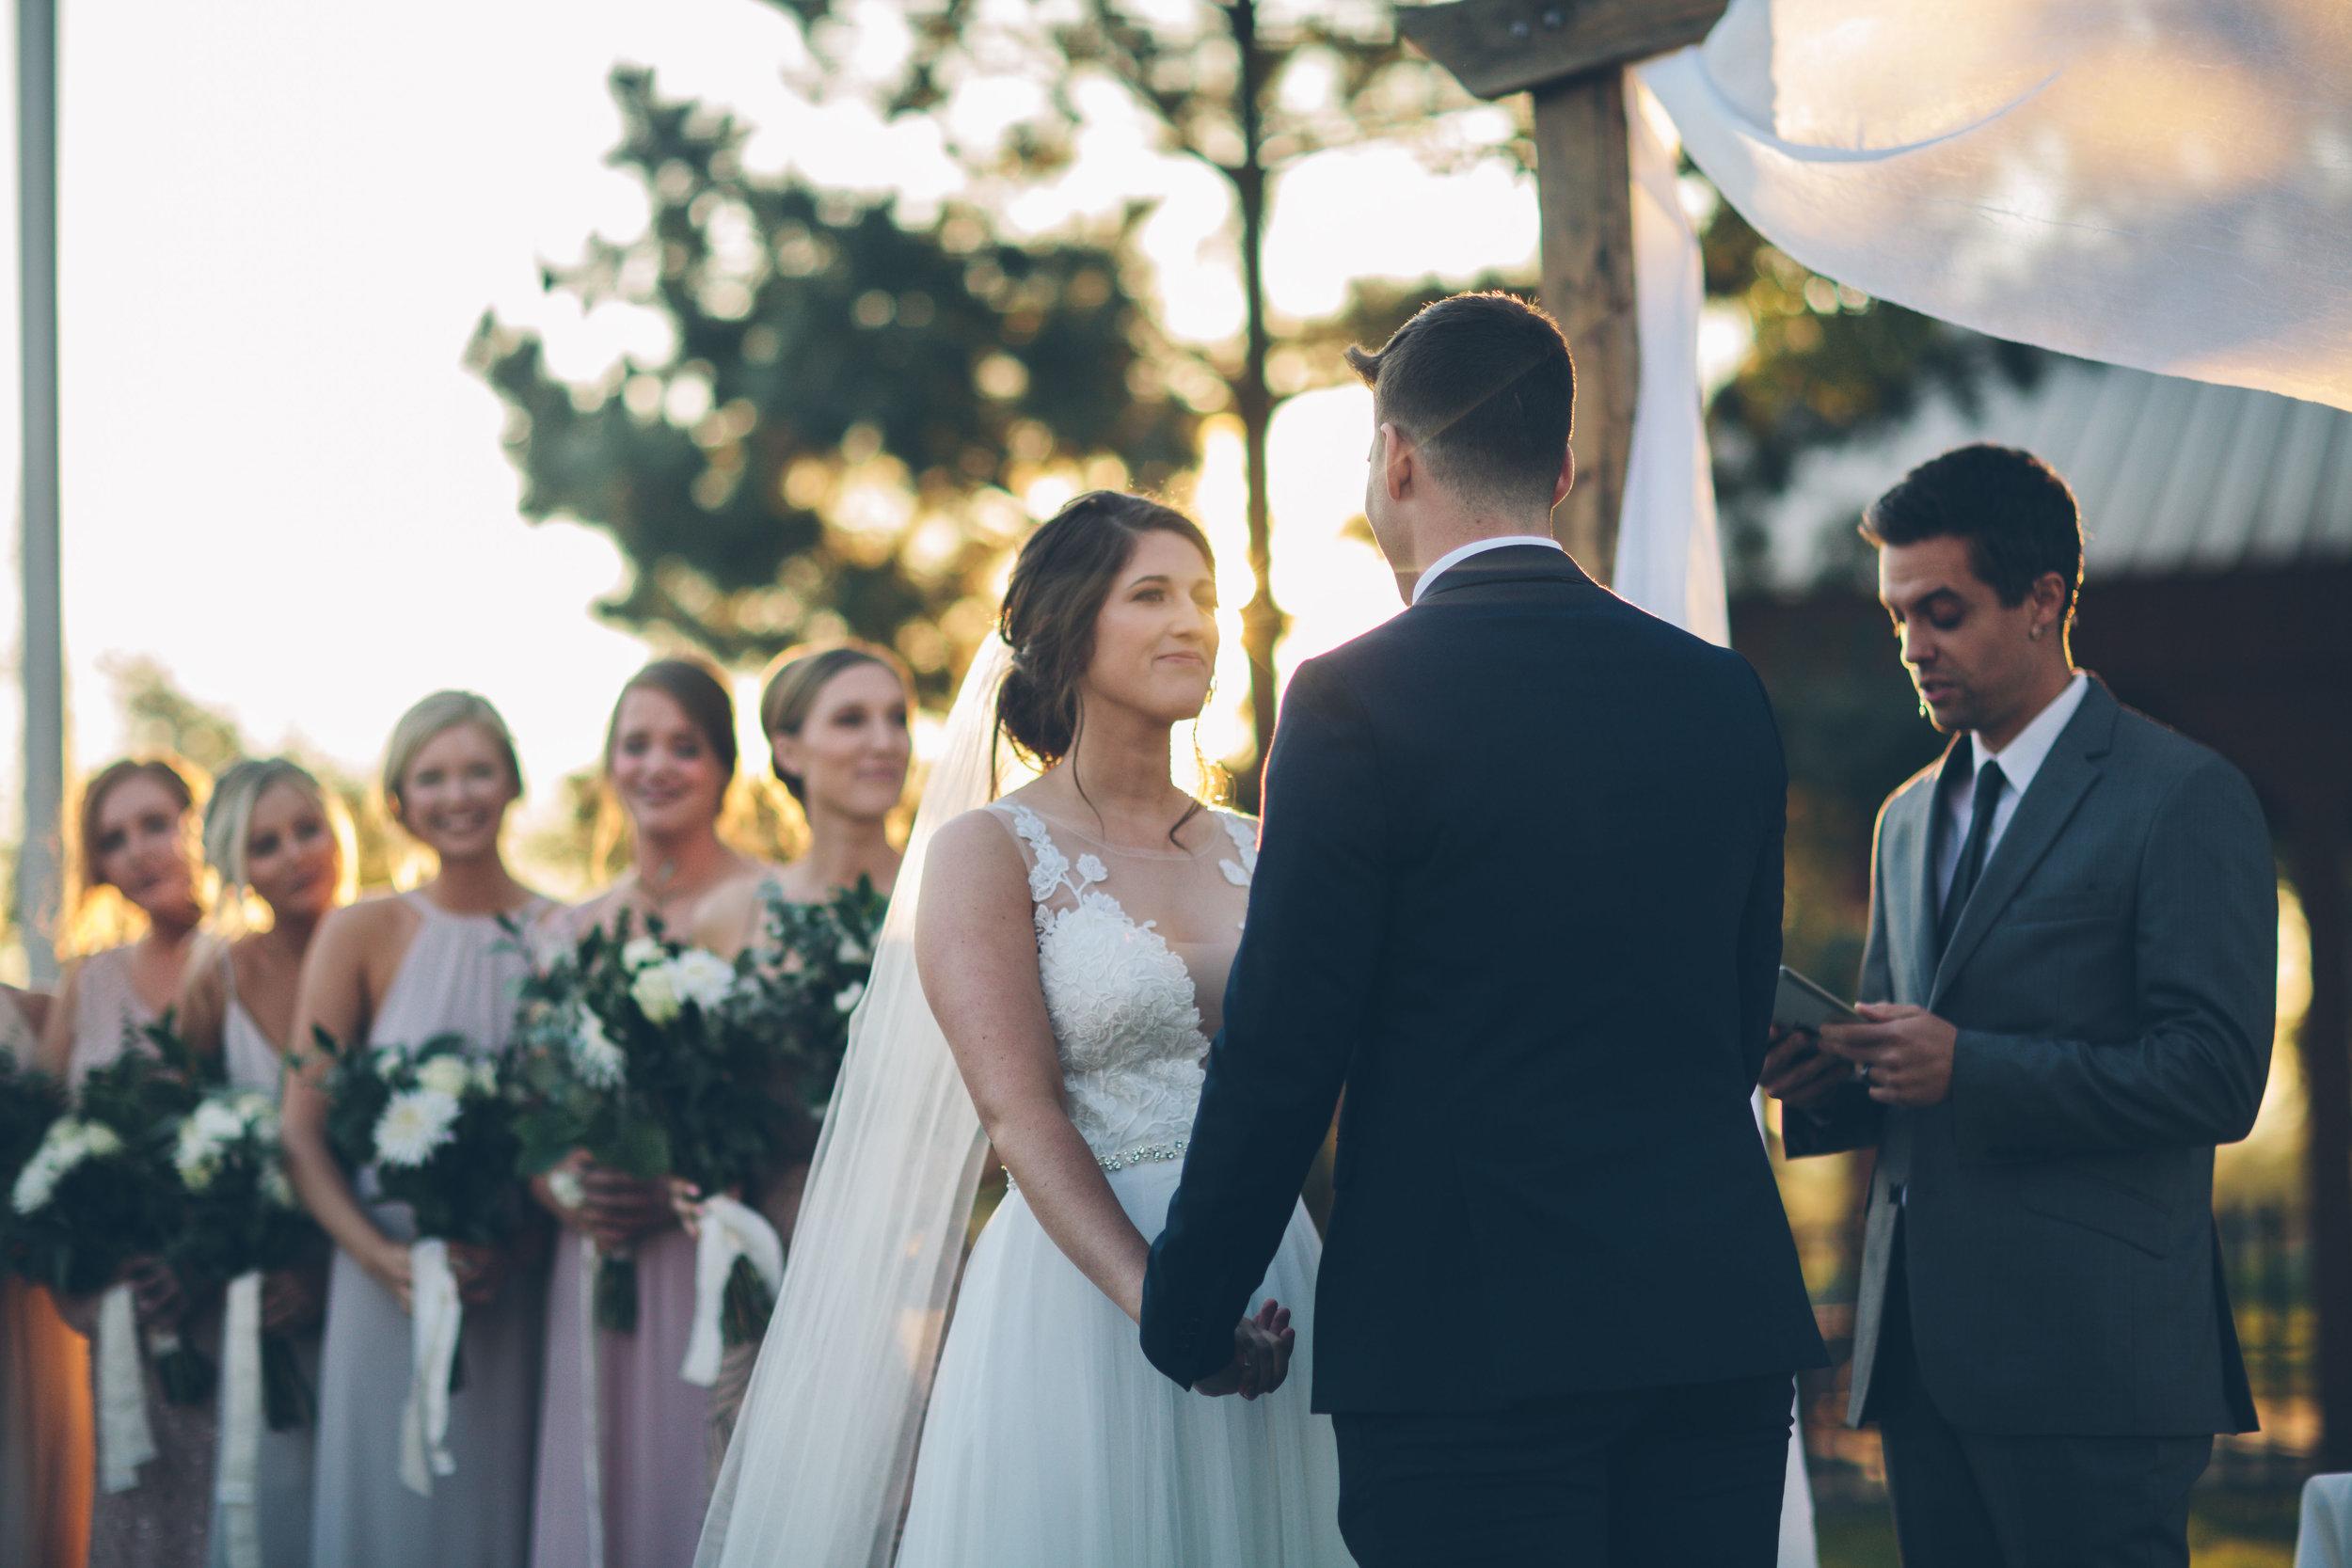 spokane ceremony wedding bride